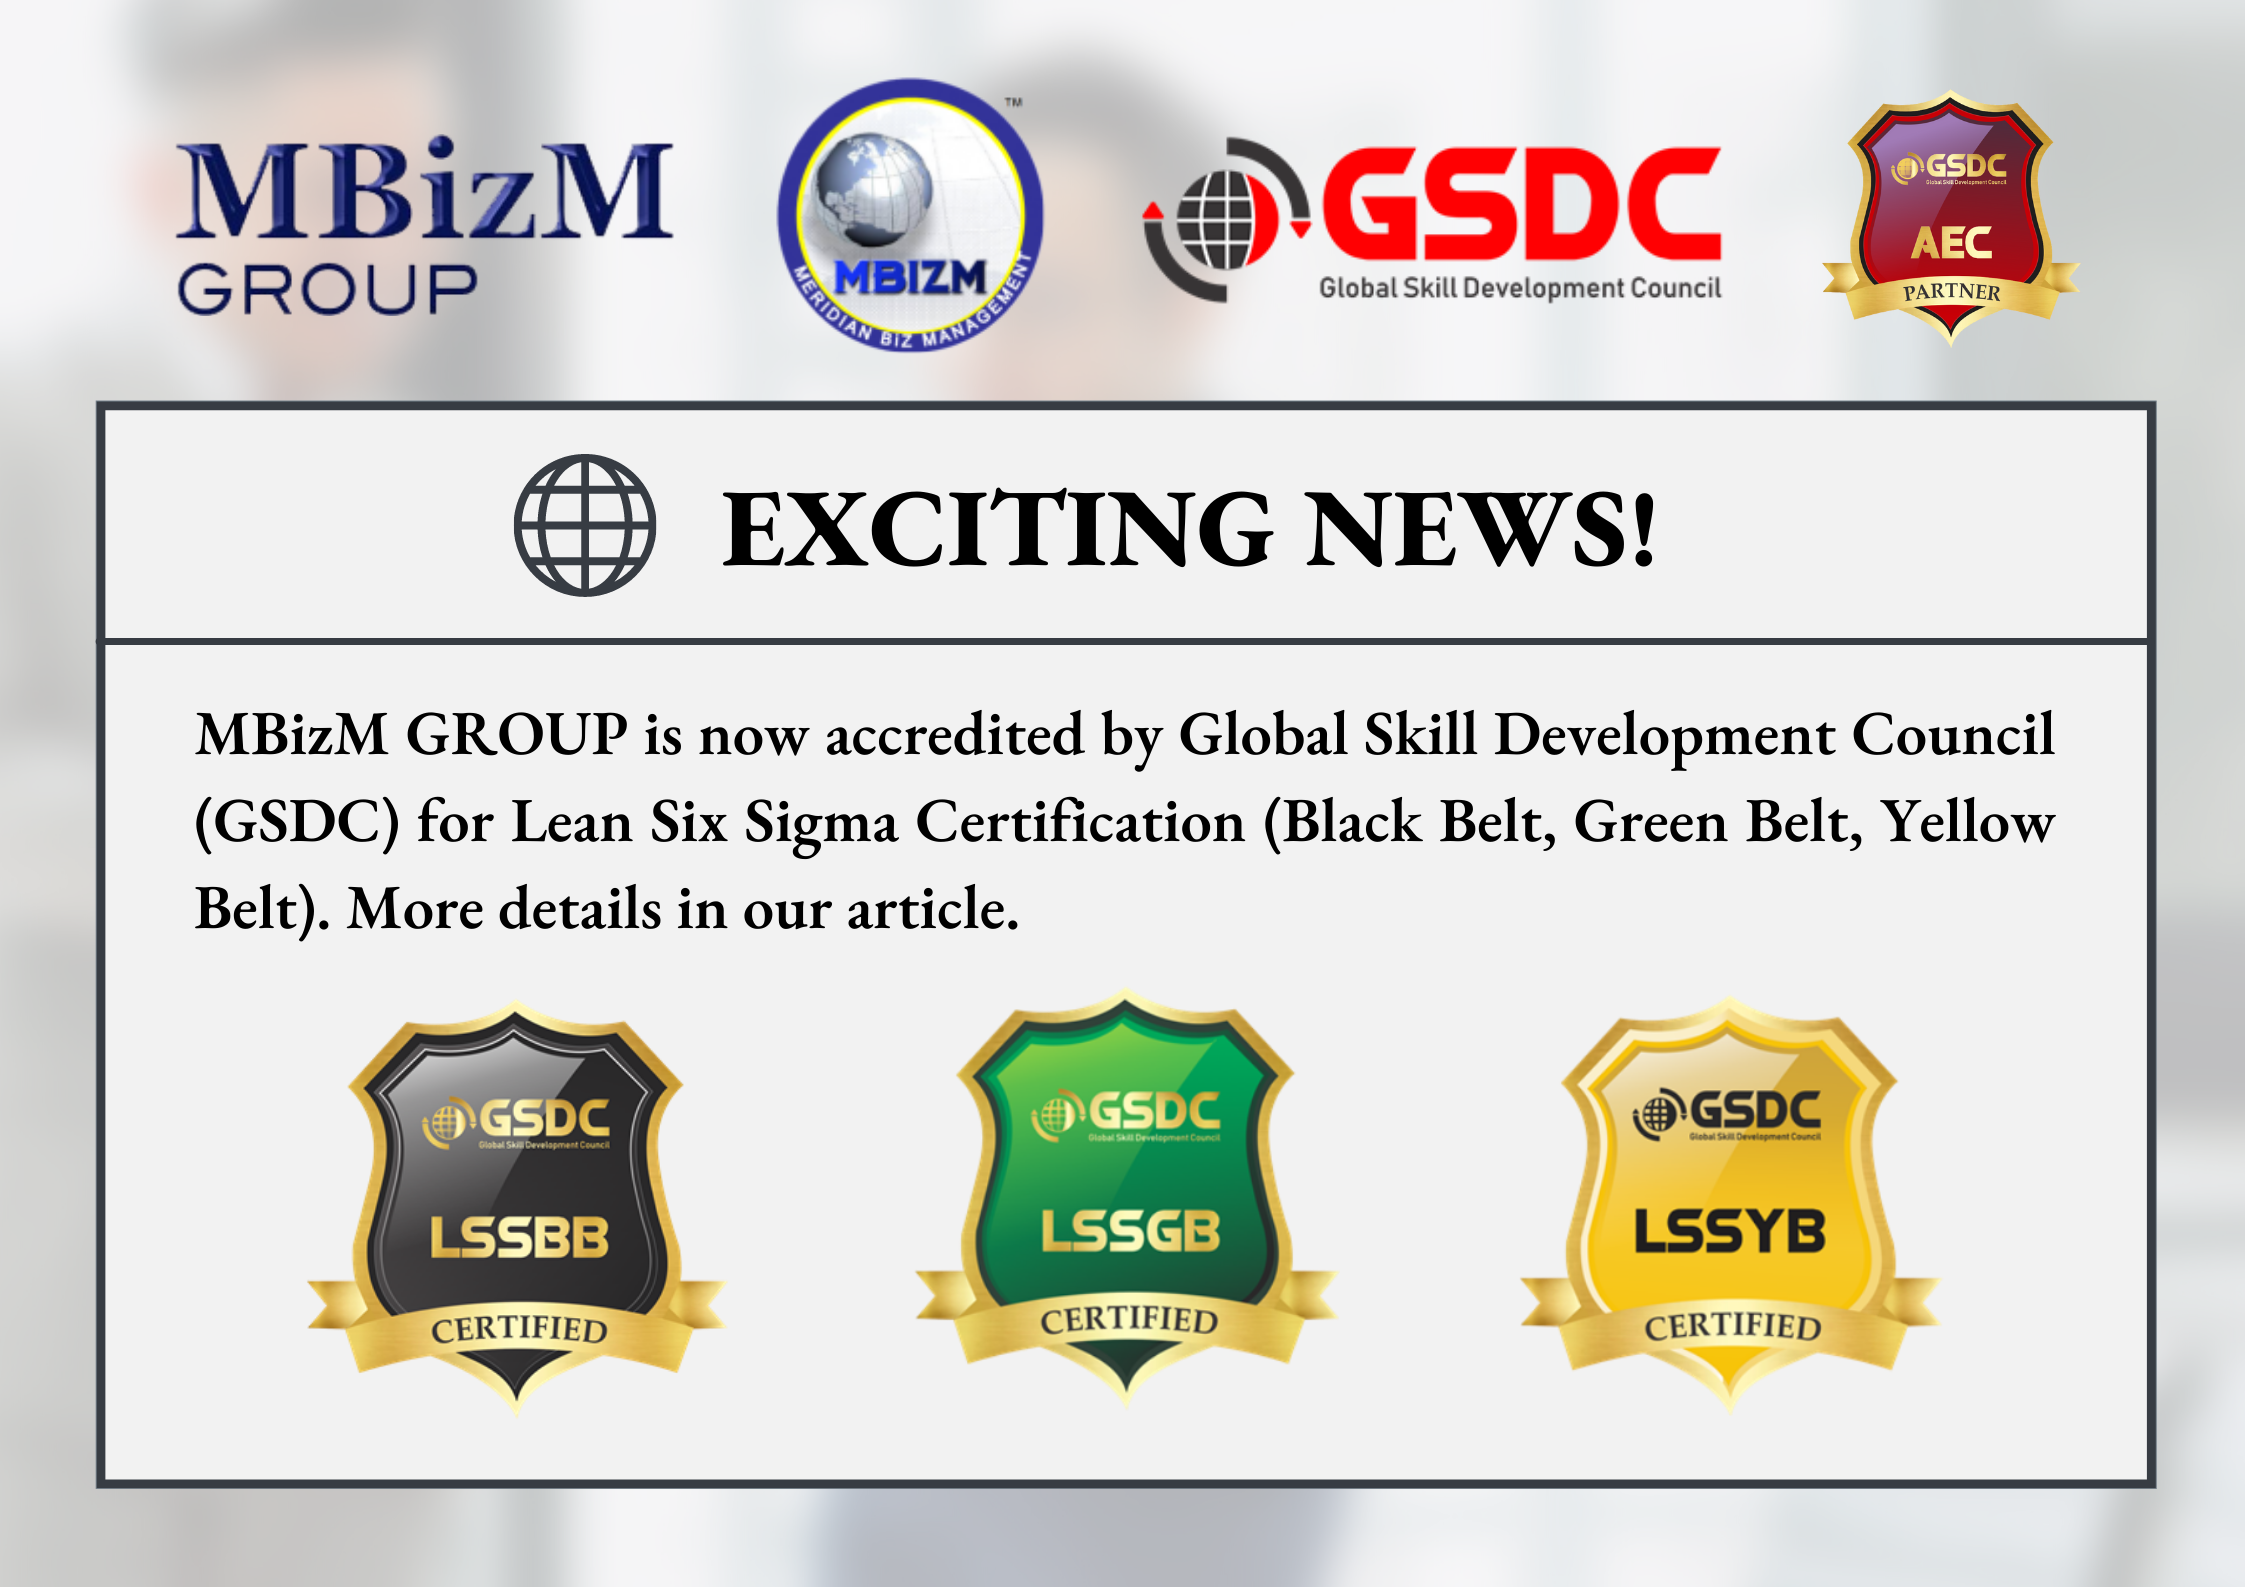 Global Skill Development Council